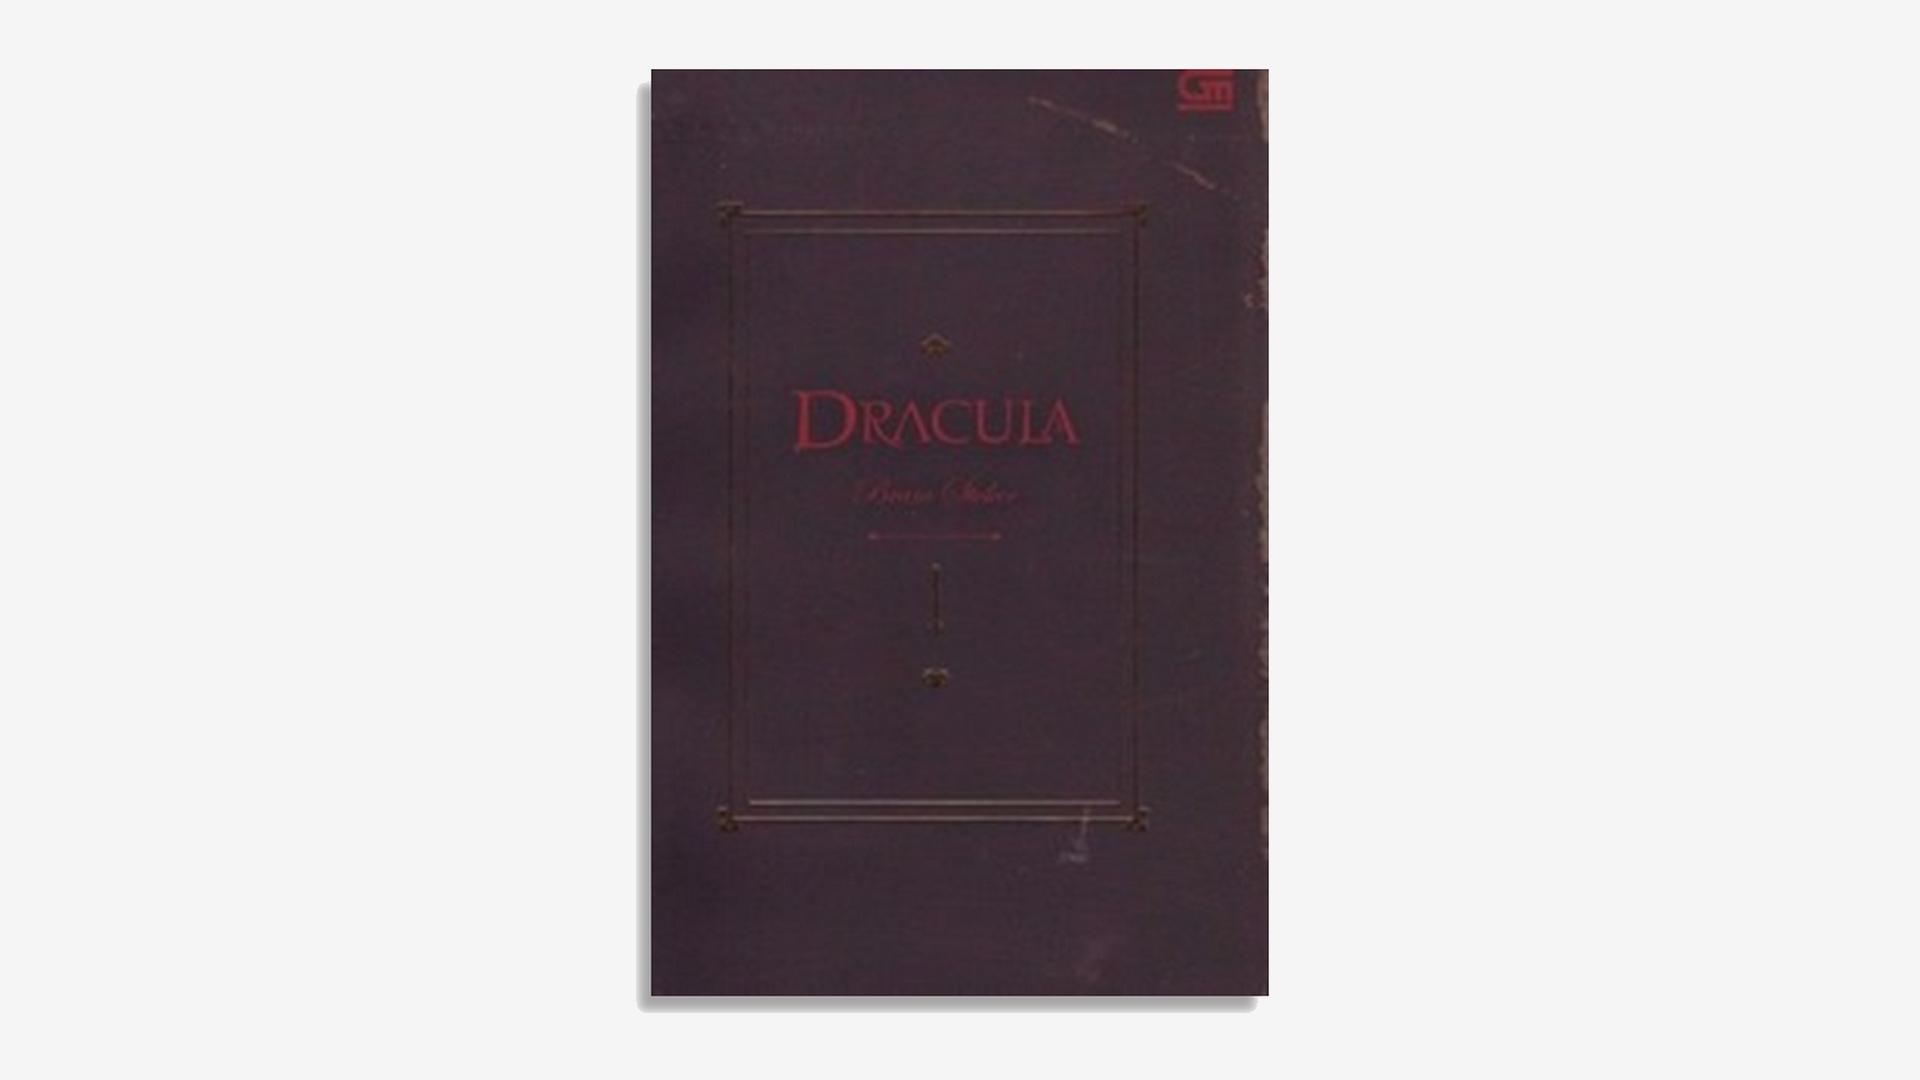 Bram Stroker – Dracula